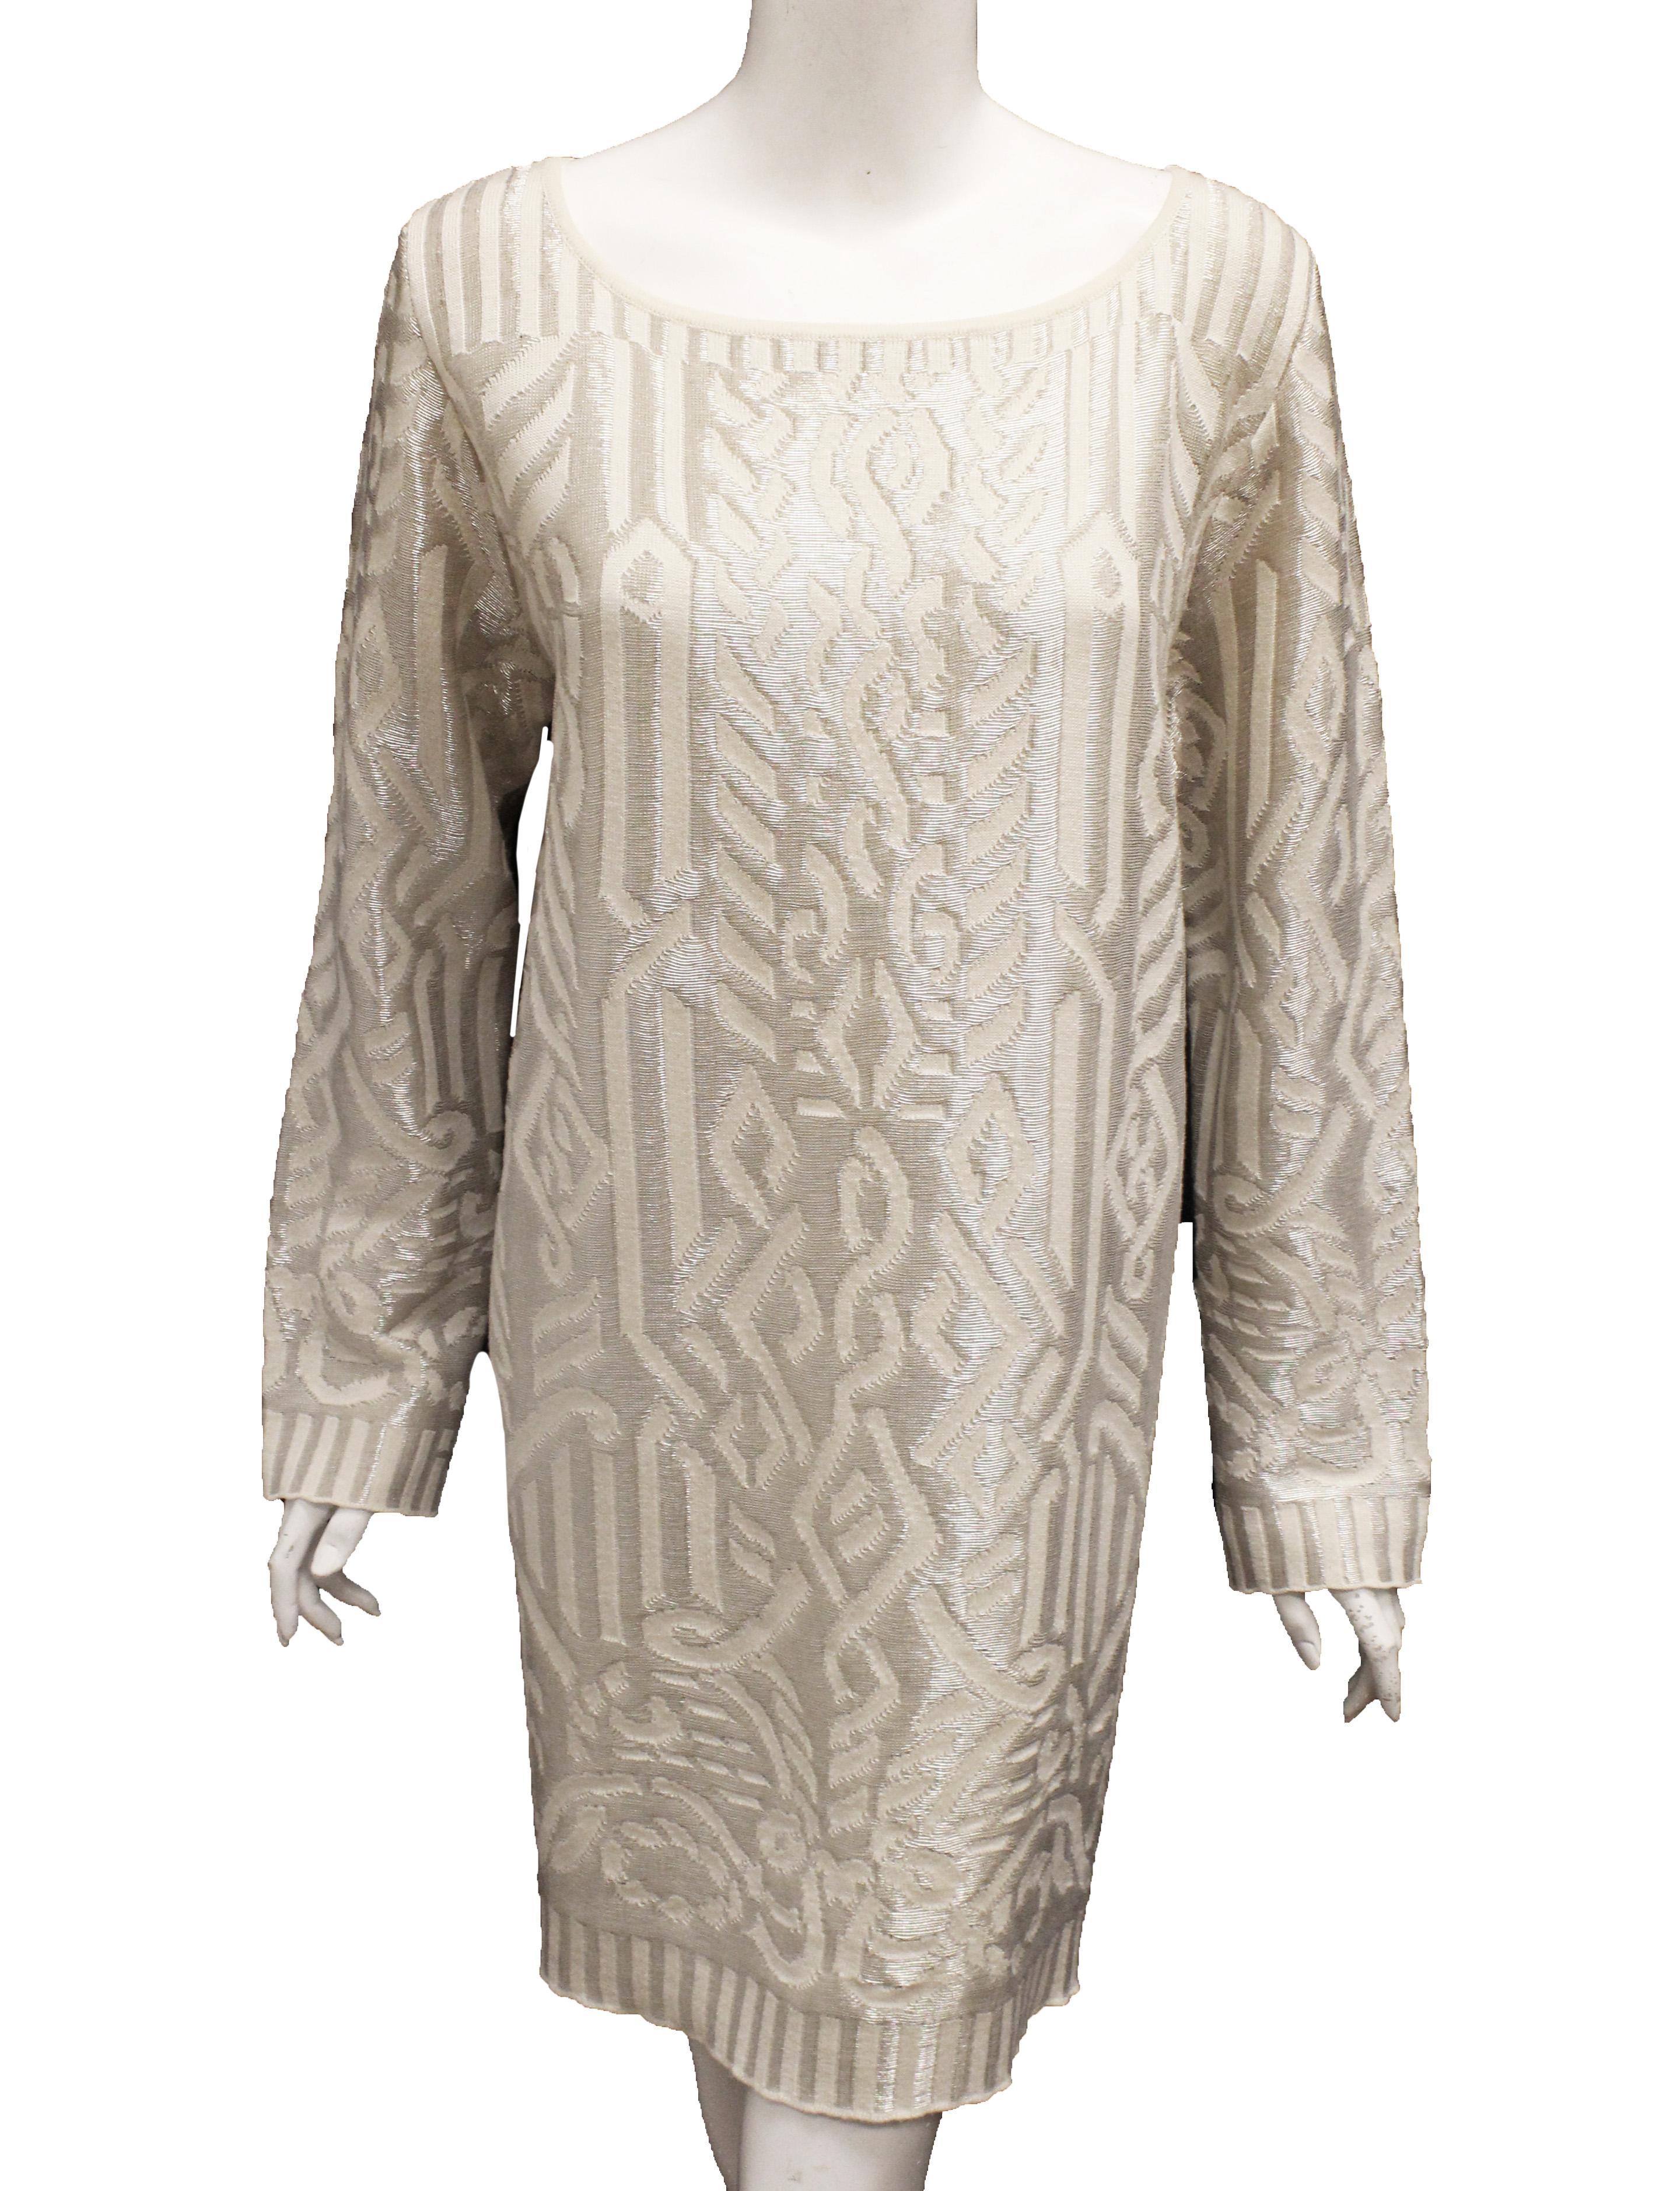 Escada Ivory Tunic Style Sweater Dress with Silver Metallic Threads